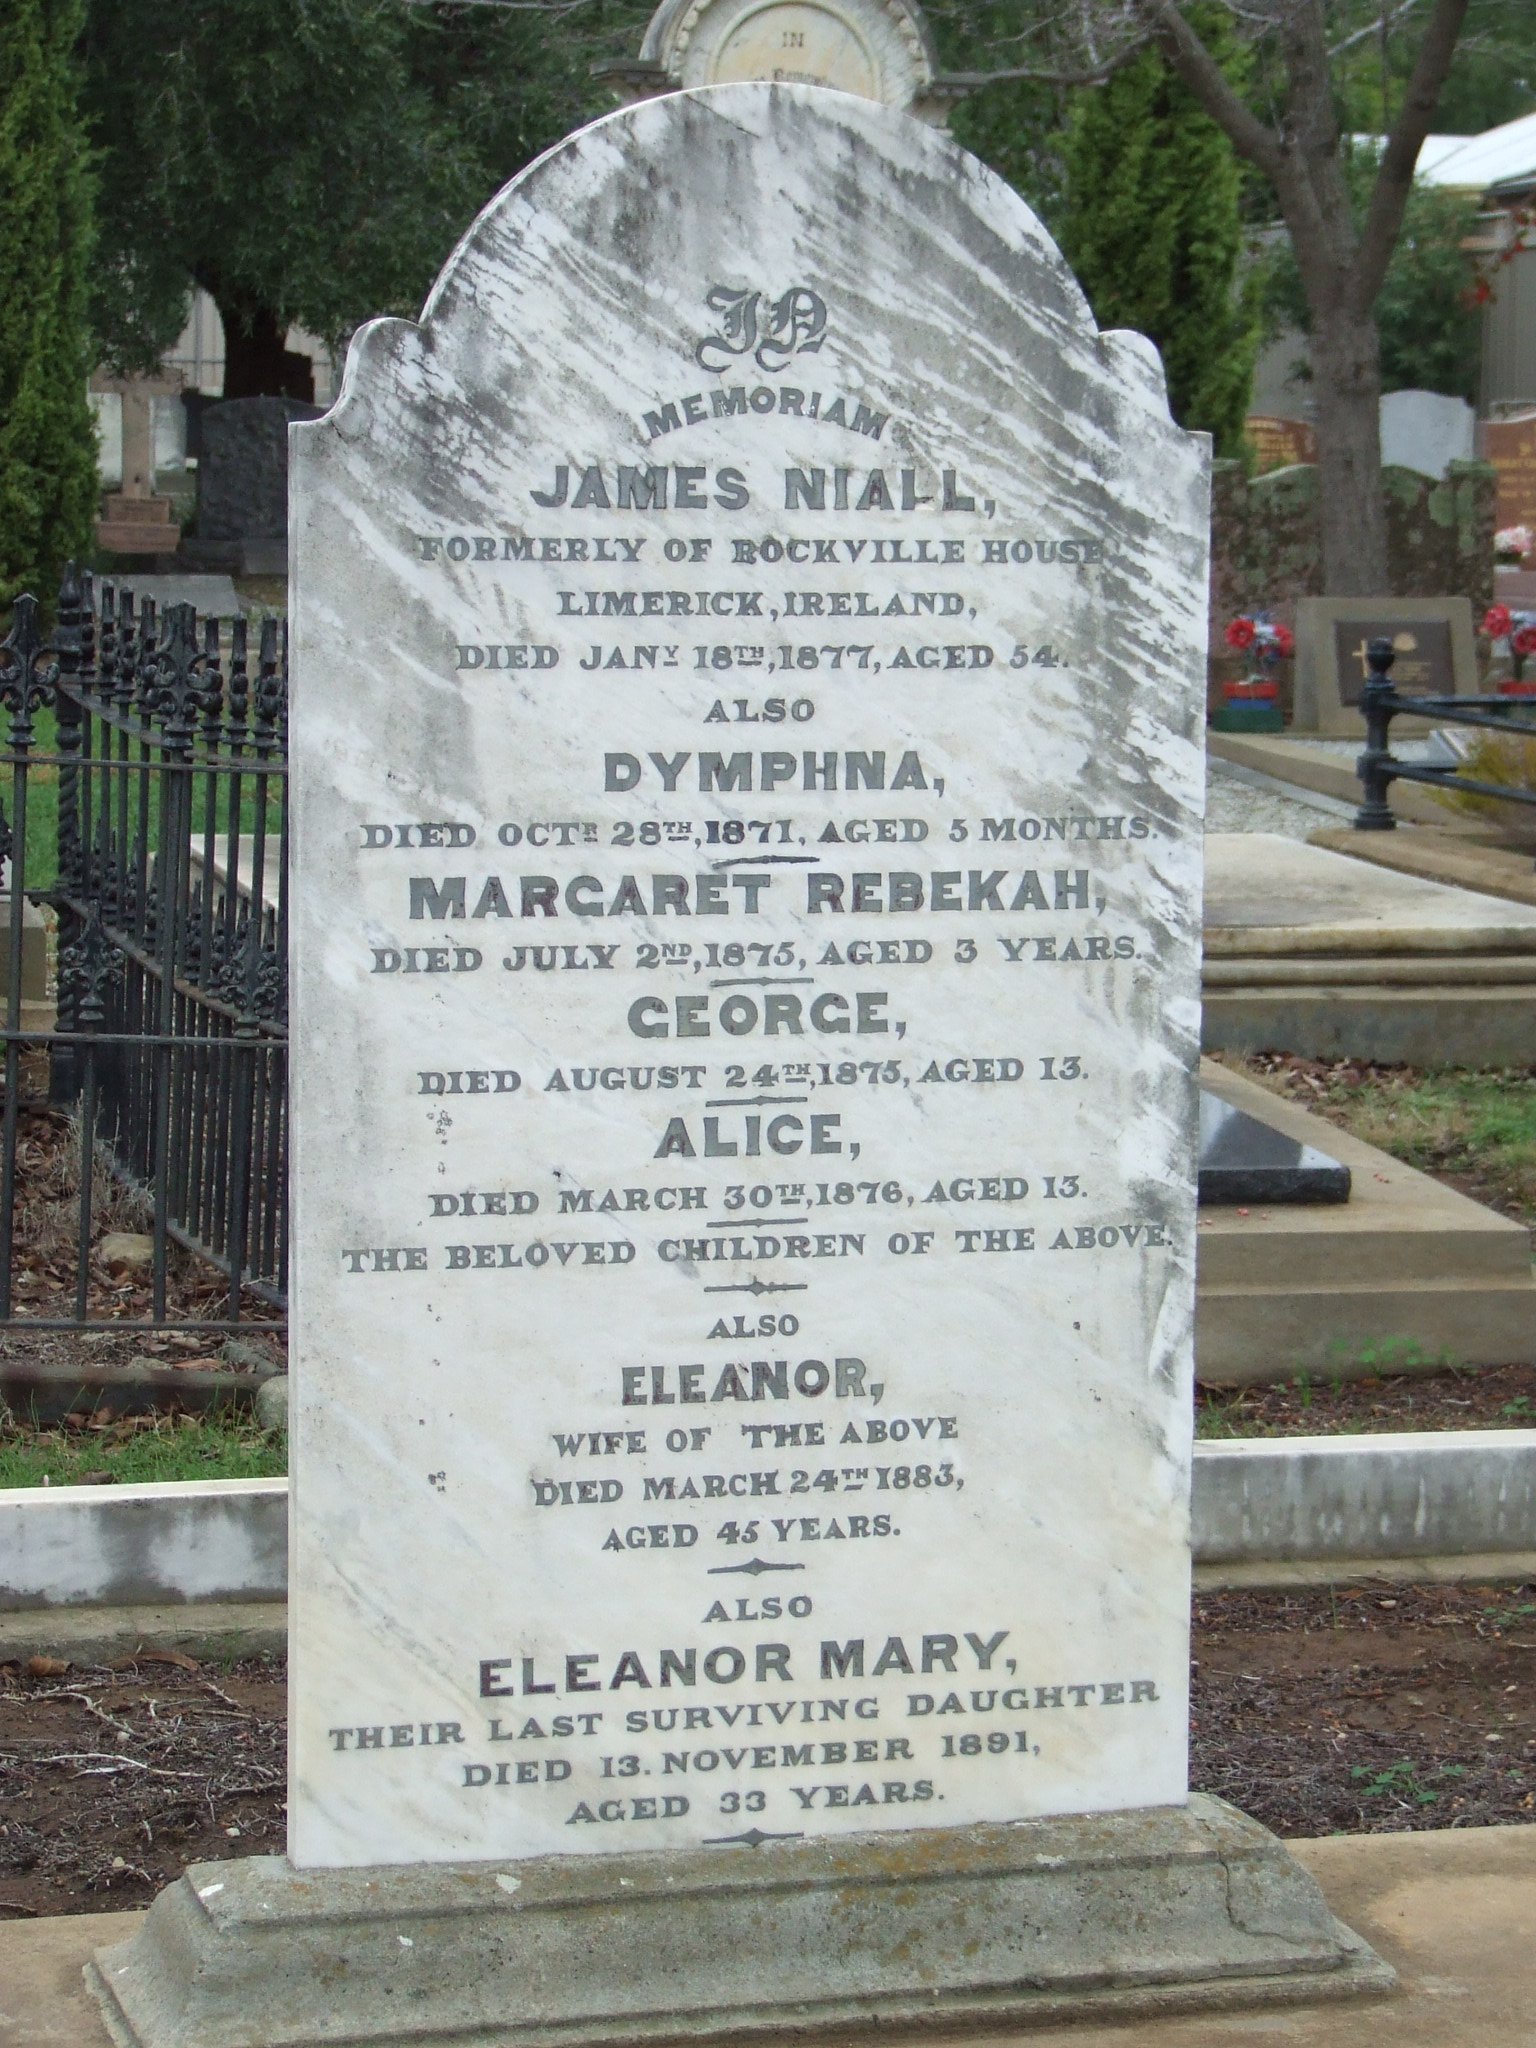 NIALL, James & Dymphna & Margaret Rebekah & George & Alice & Eleanor & Eleanor Mary